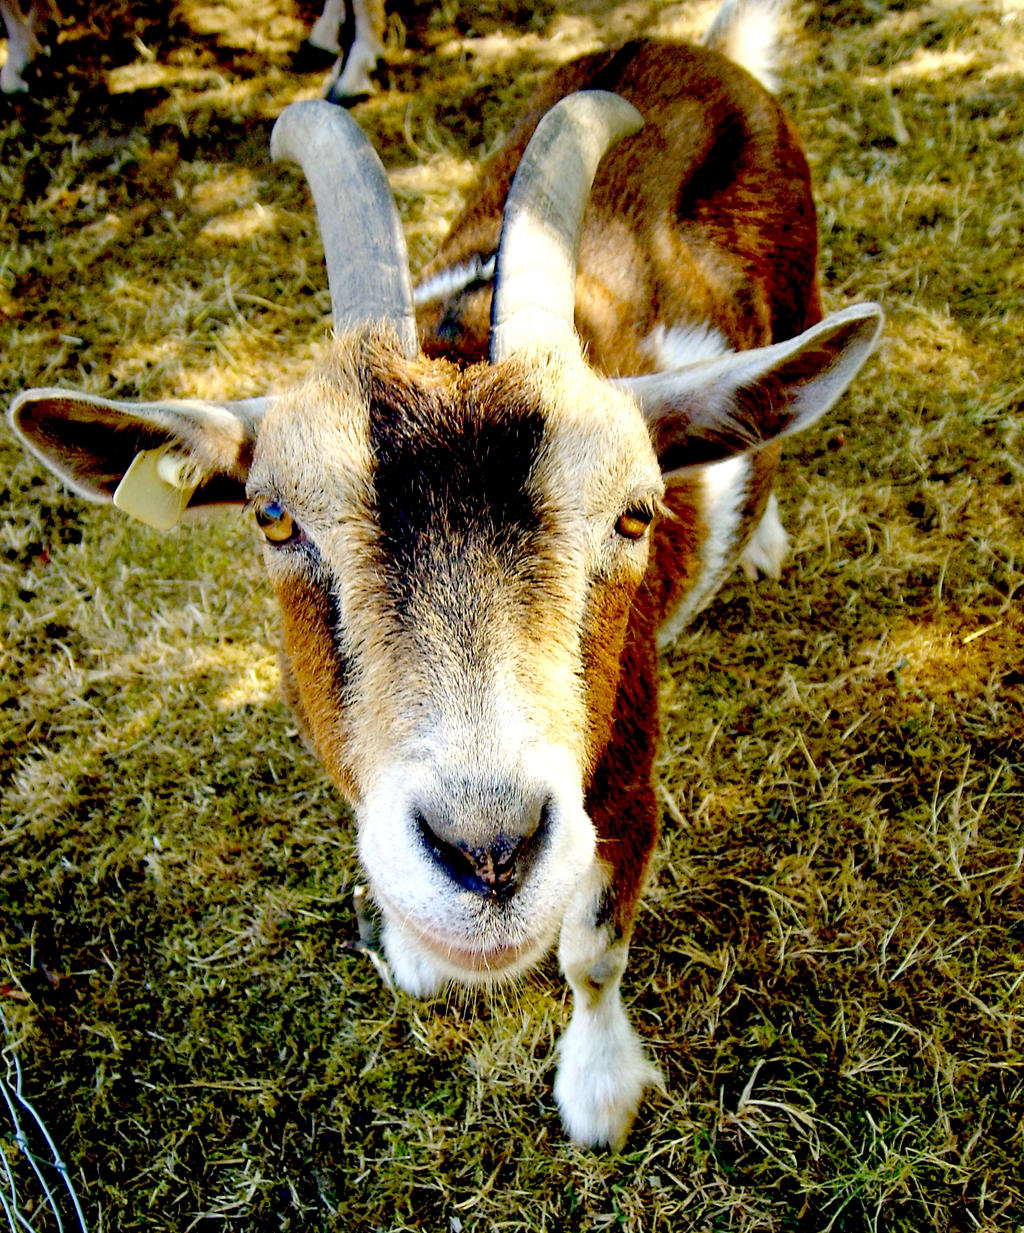 Brown Goat by ScHoKoKeKsChEn